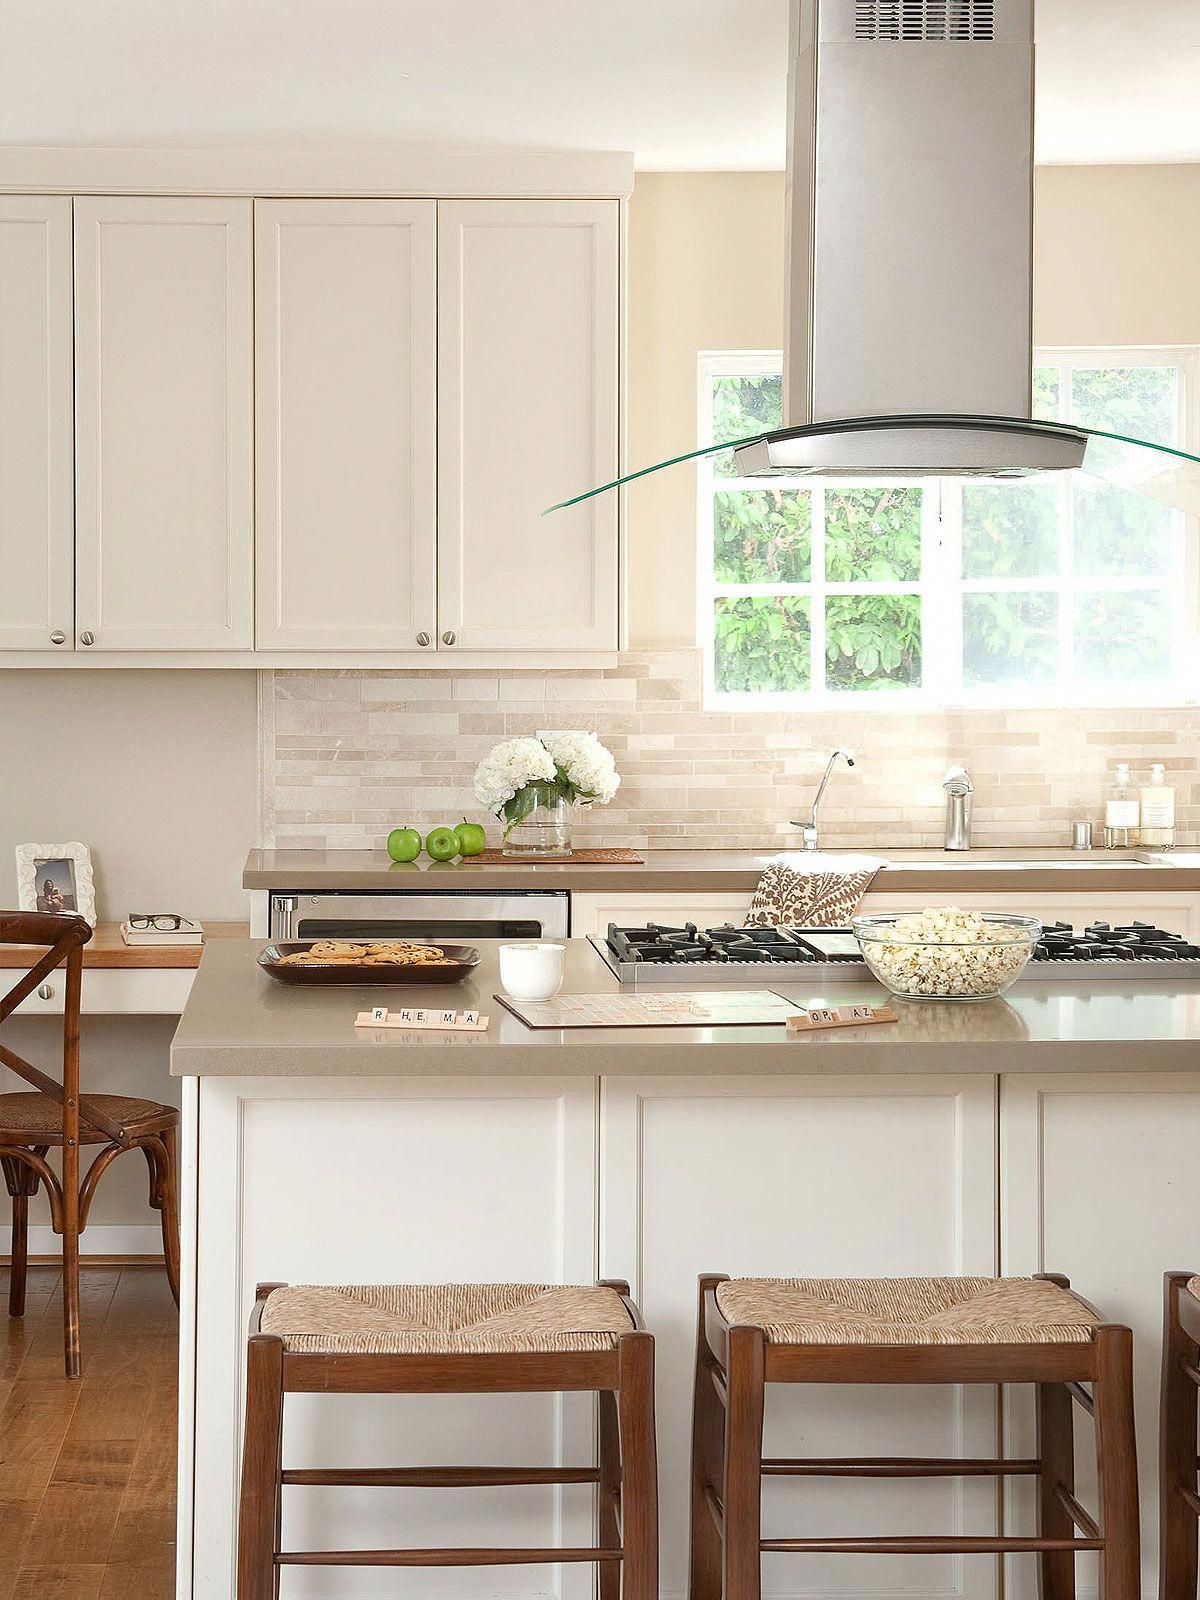 25 Minimalist And Stylish Kitchen Design Concepts #eweddingmag #HomeDecorationSuggestions #HomeDesign #kitchendesignpoints